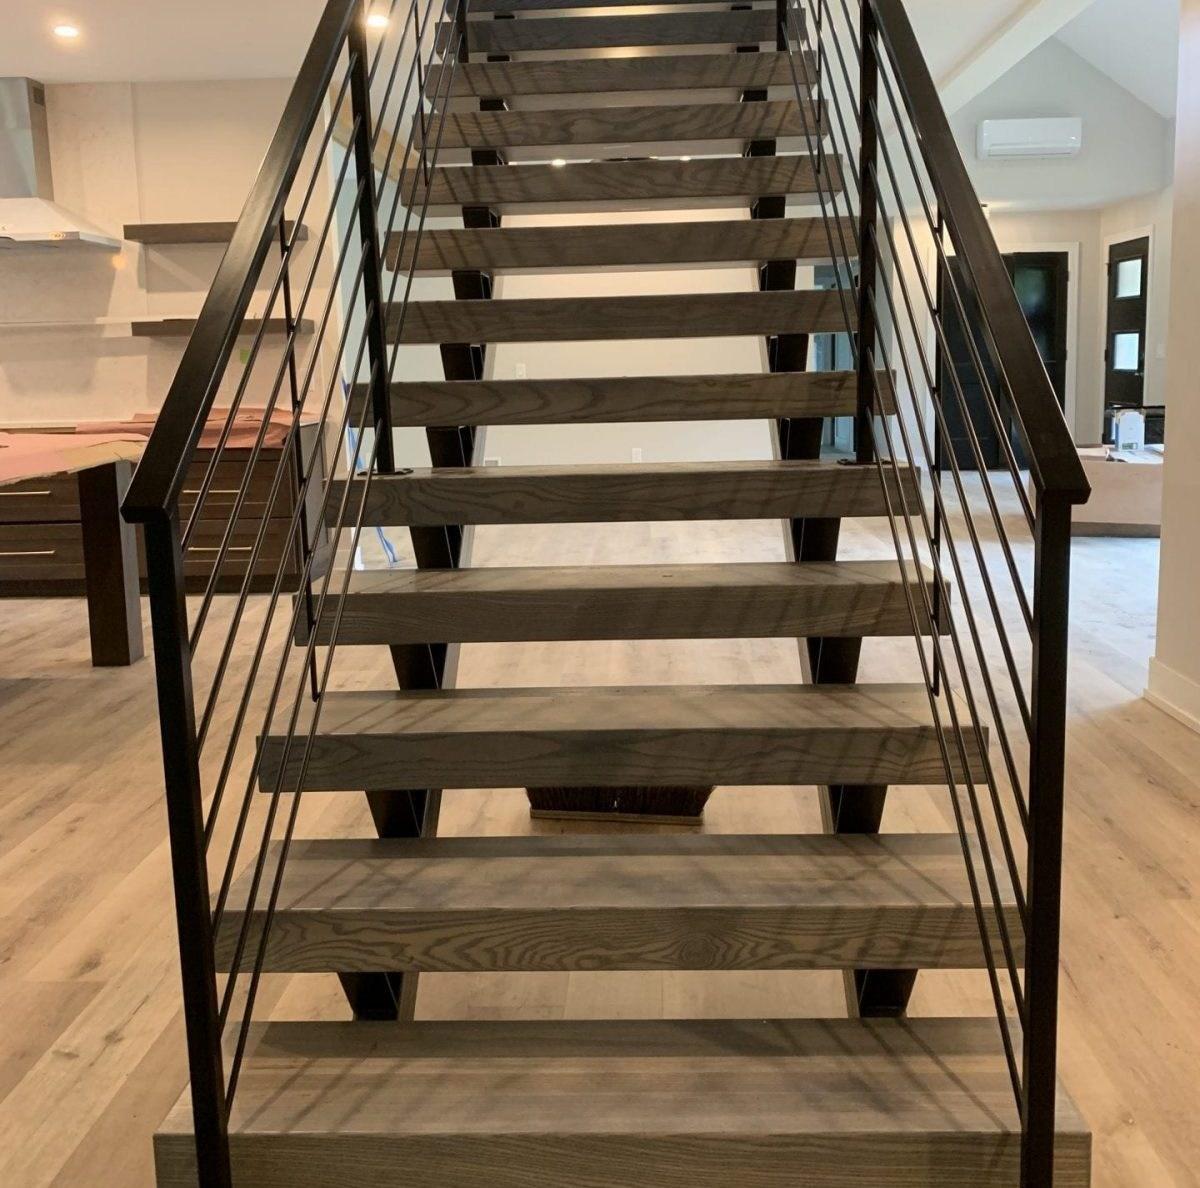 Double Stringer Floating Stairs Great Lakes Metal Fabrication   Wood Caps For Stairs   Carpet   Hardwood   Red Oak   Hardwood Flooring   Reclaimed Wood